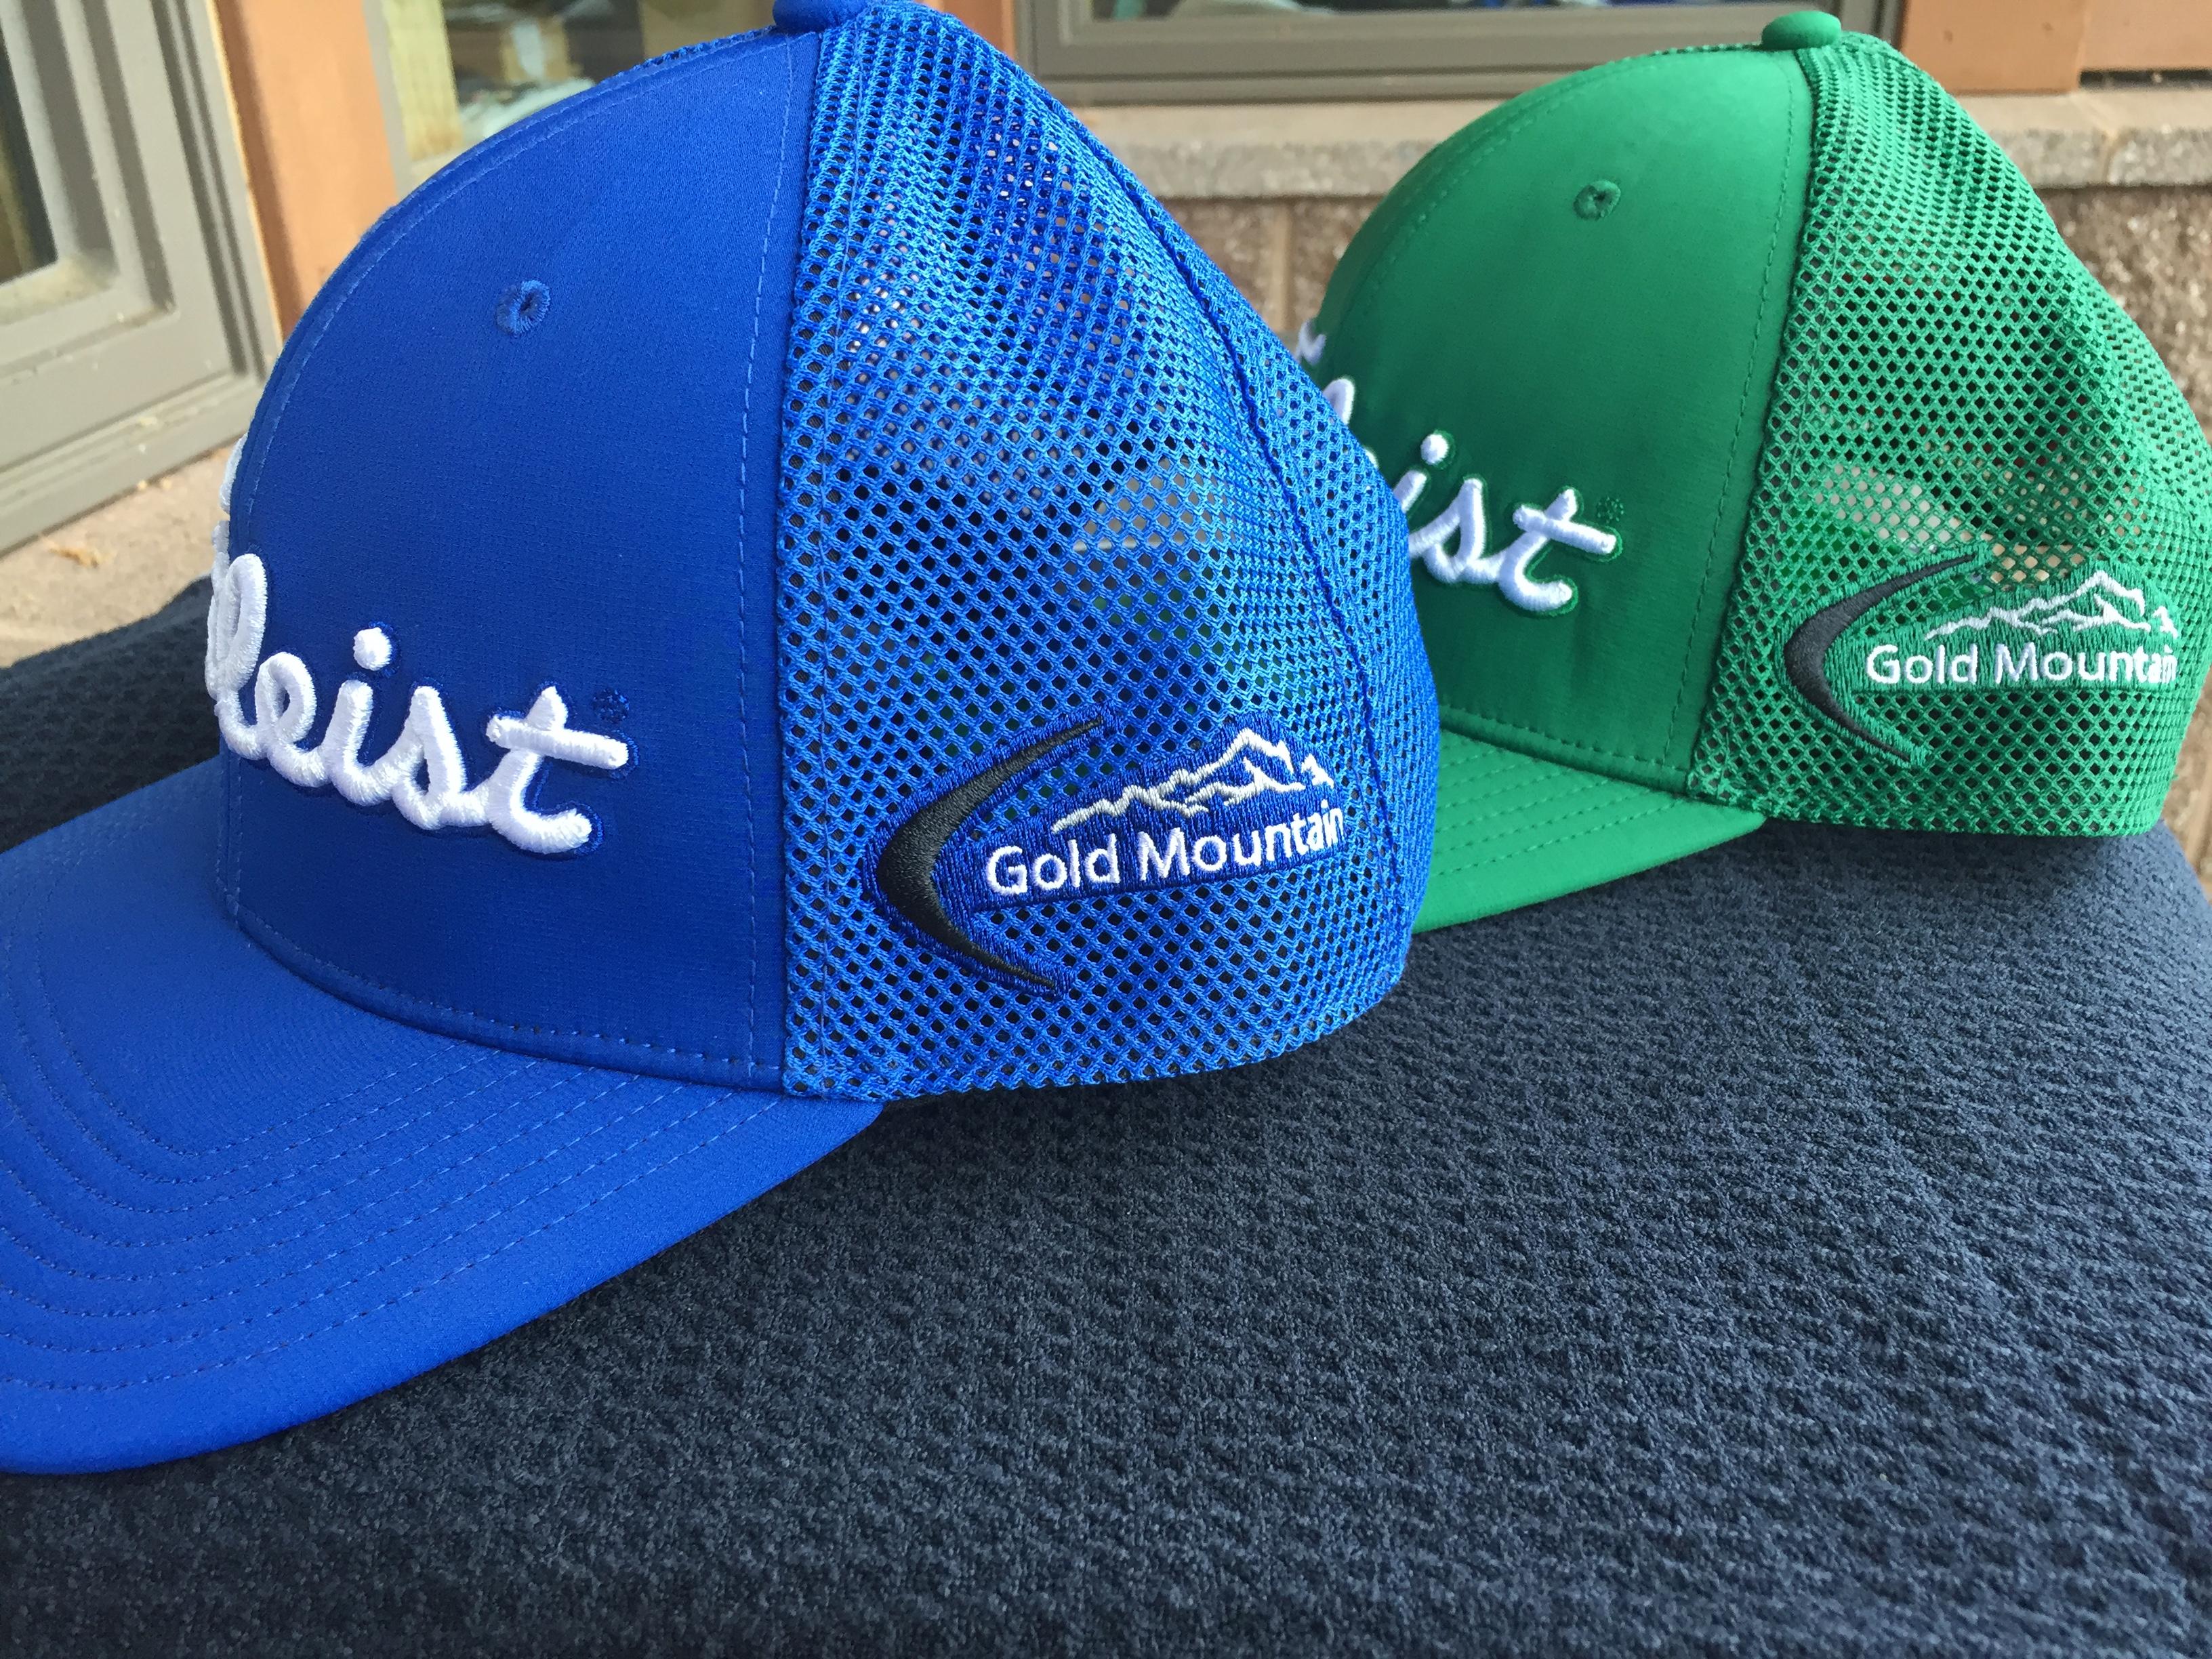 ea7a1698aef Titleist tour mesh snap back hat gold mountain golf club jpg 3264x2448 Titleist  cap side back